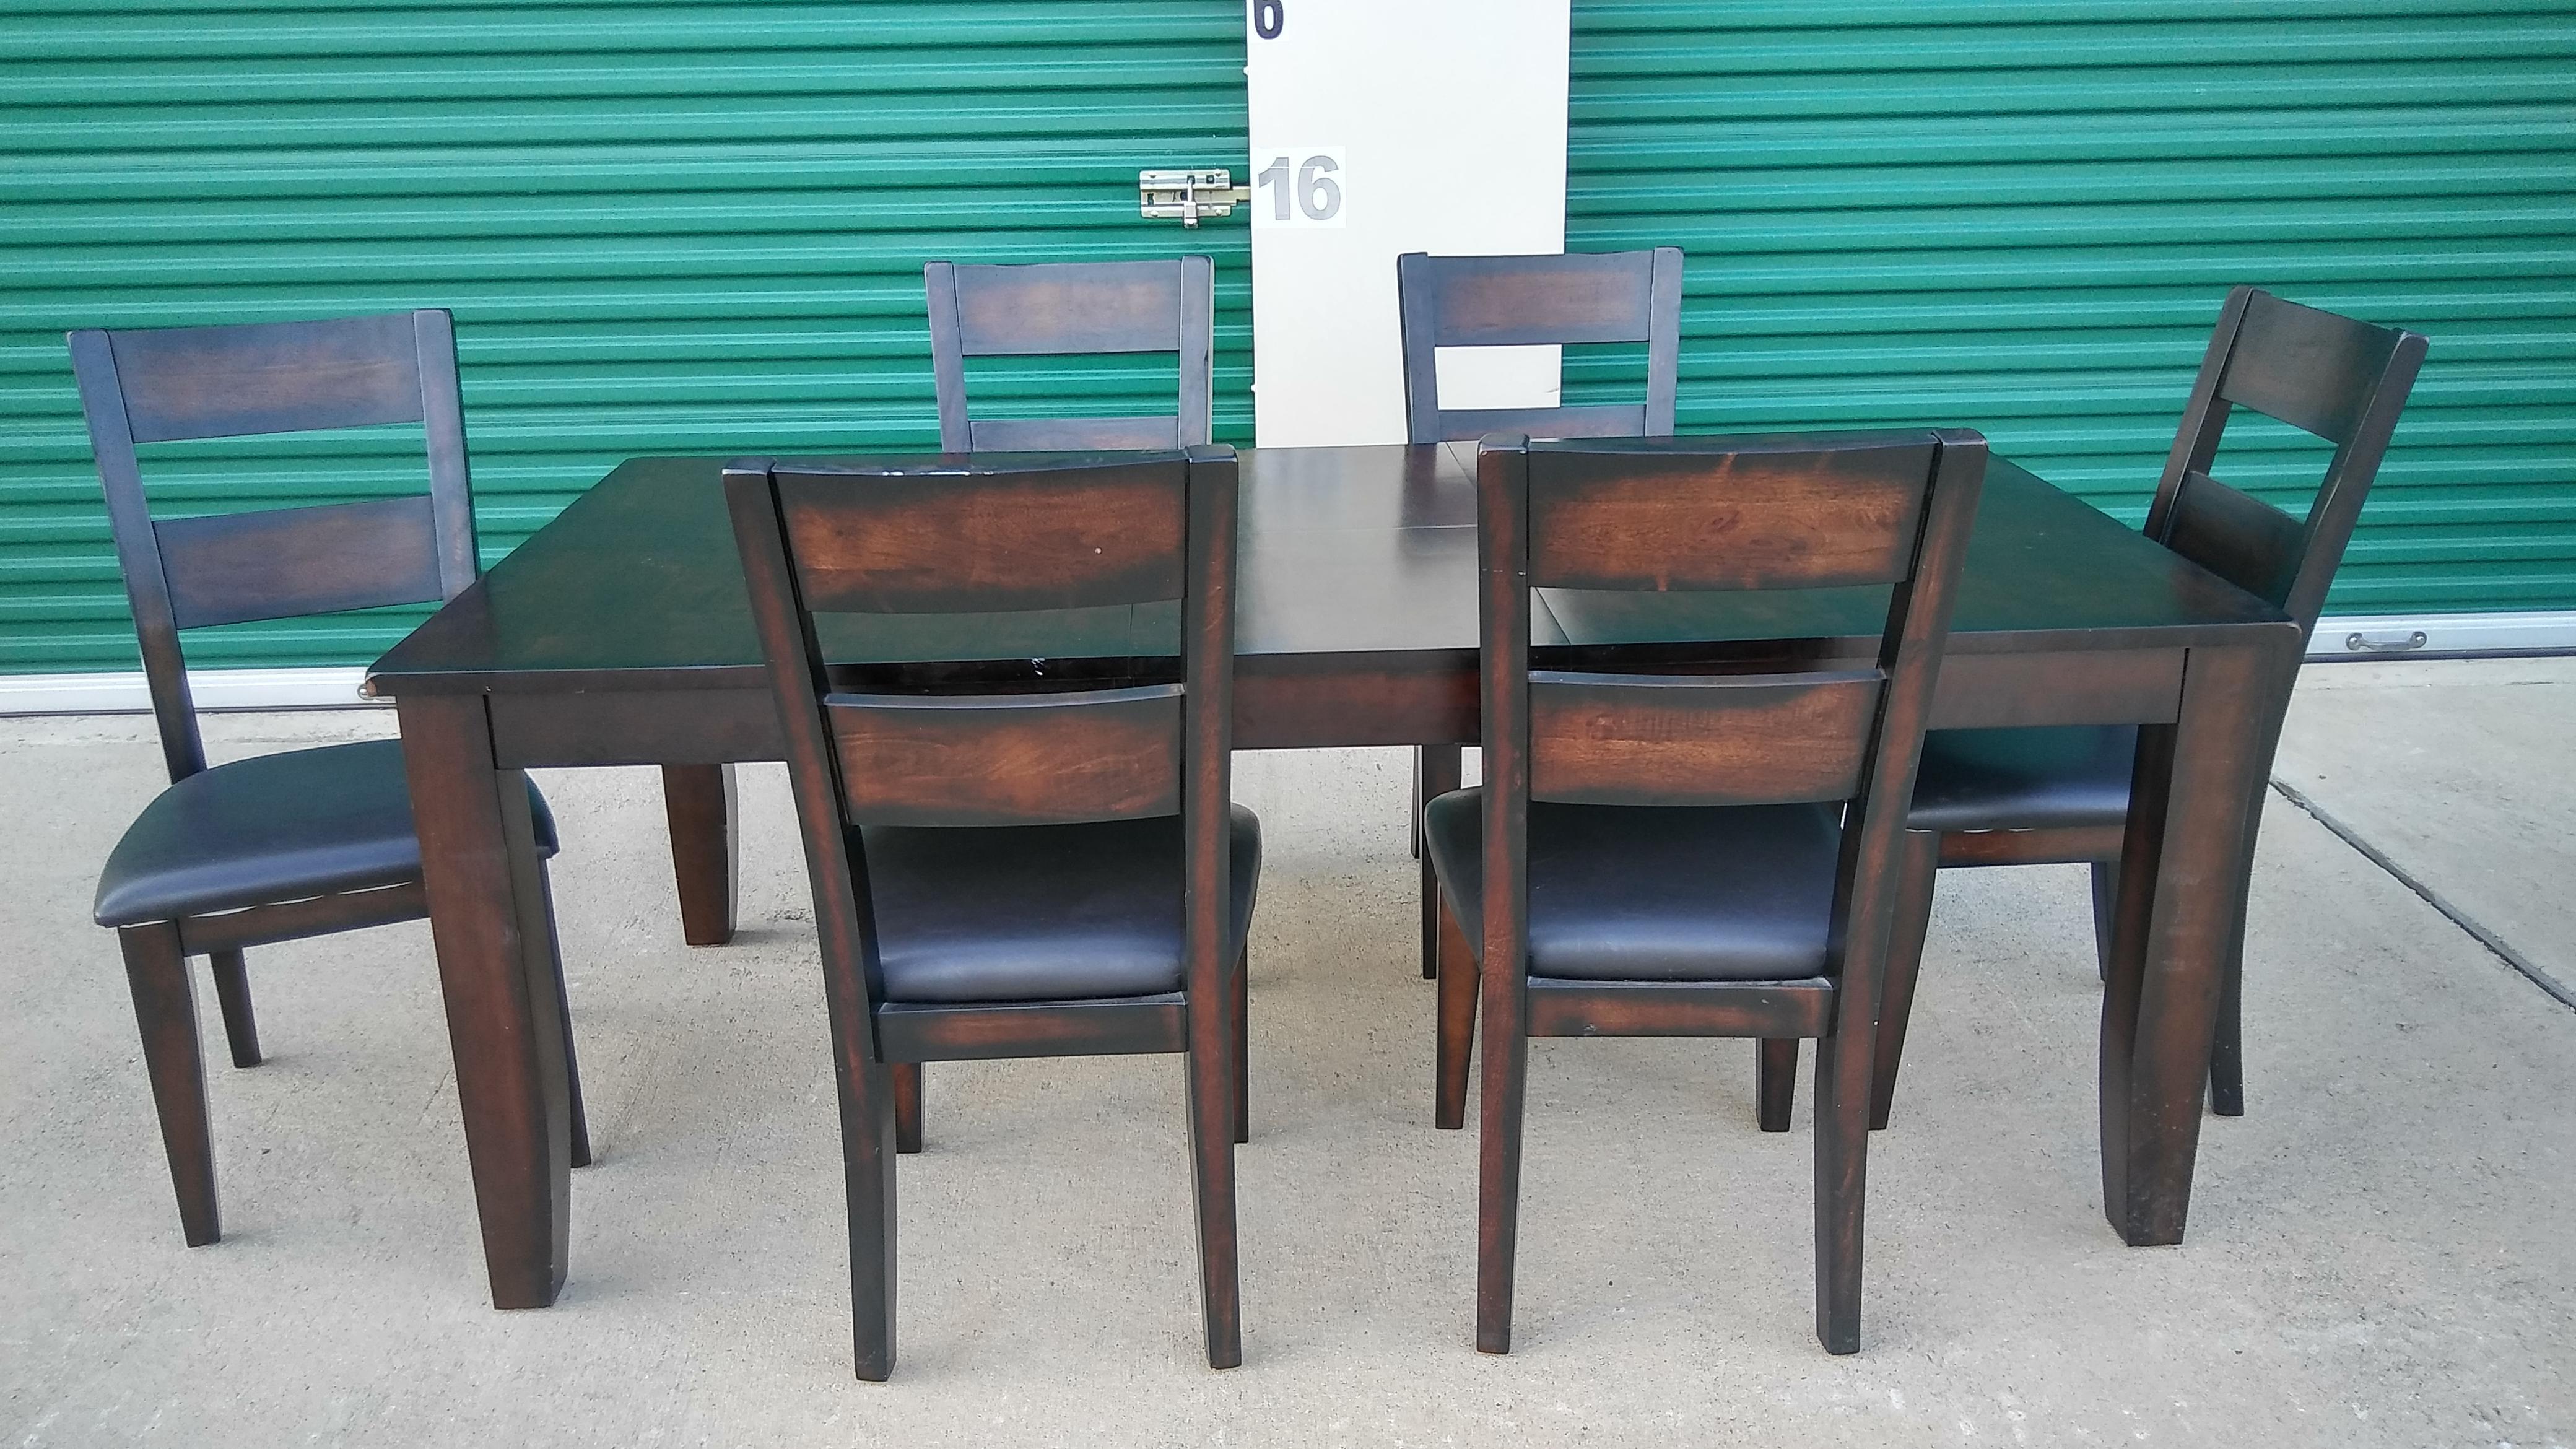 7 Piece Star Furniture Espresso Colour Dining Room Set   Image 2 Of 5